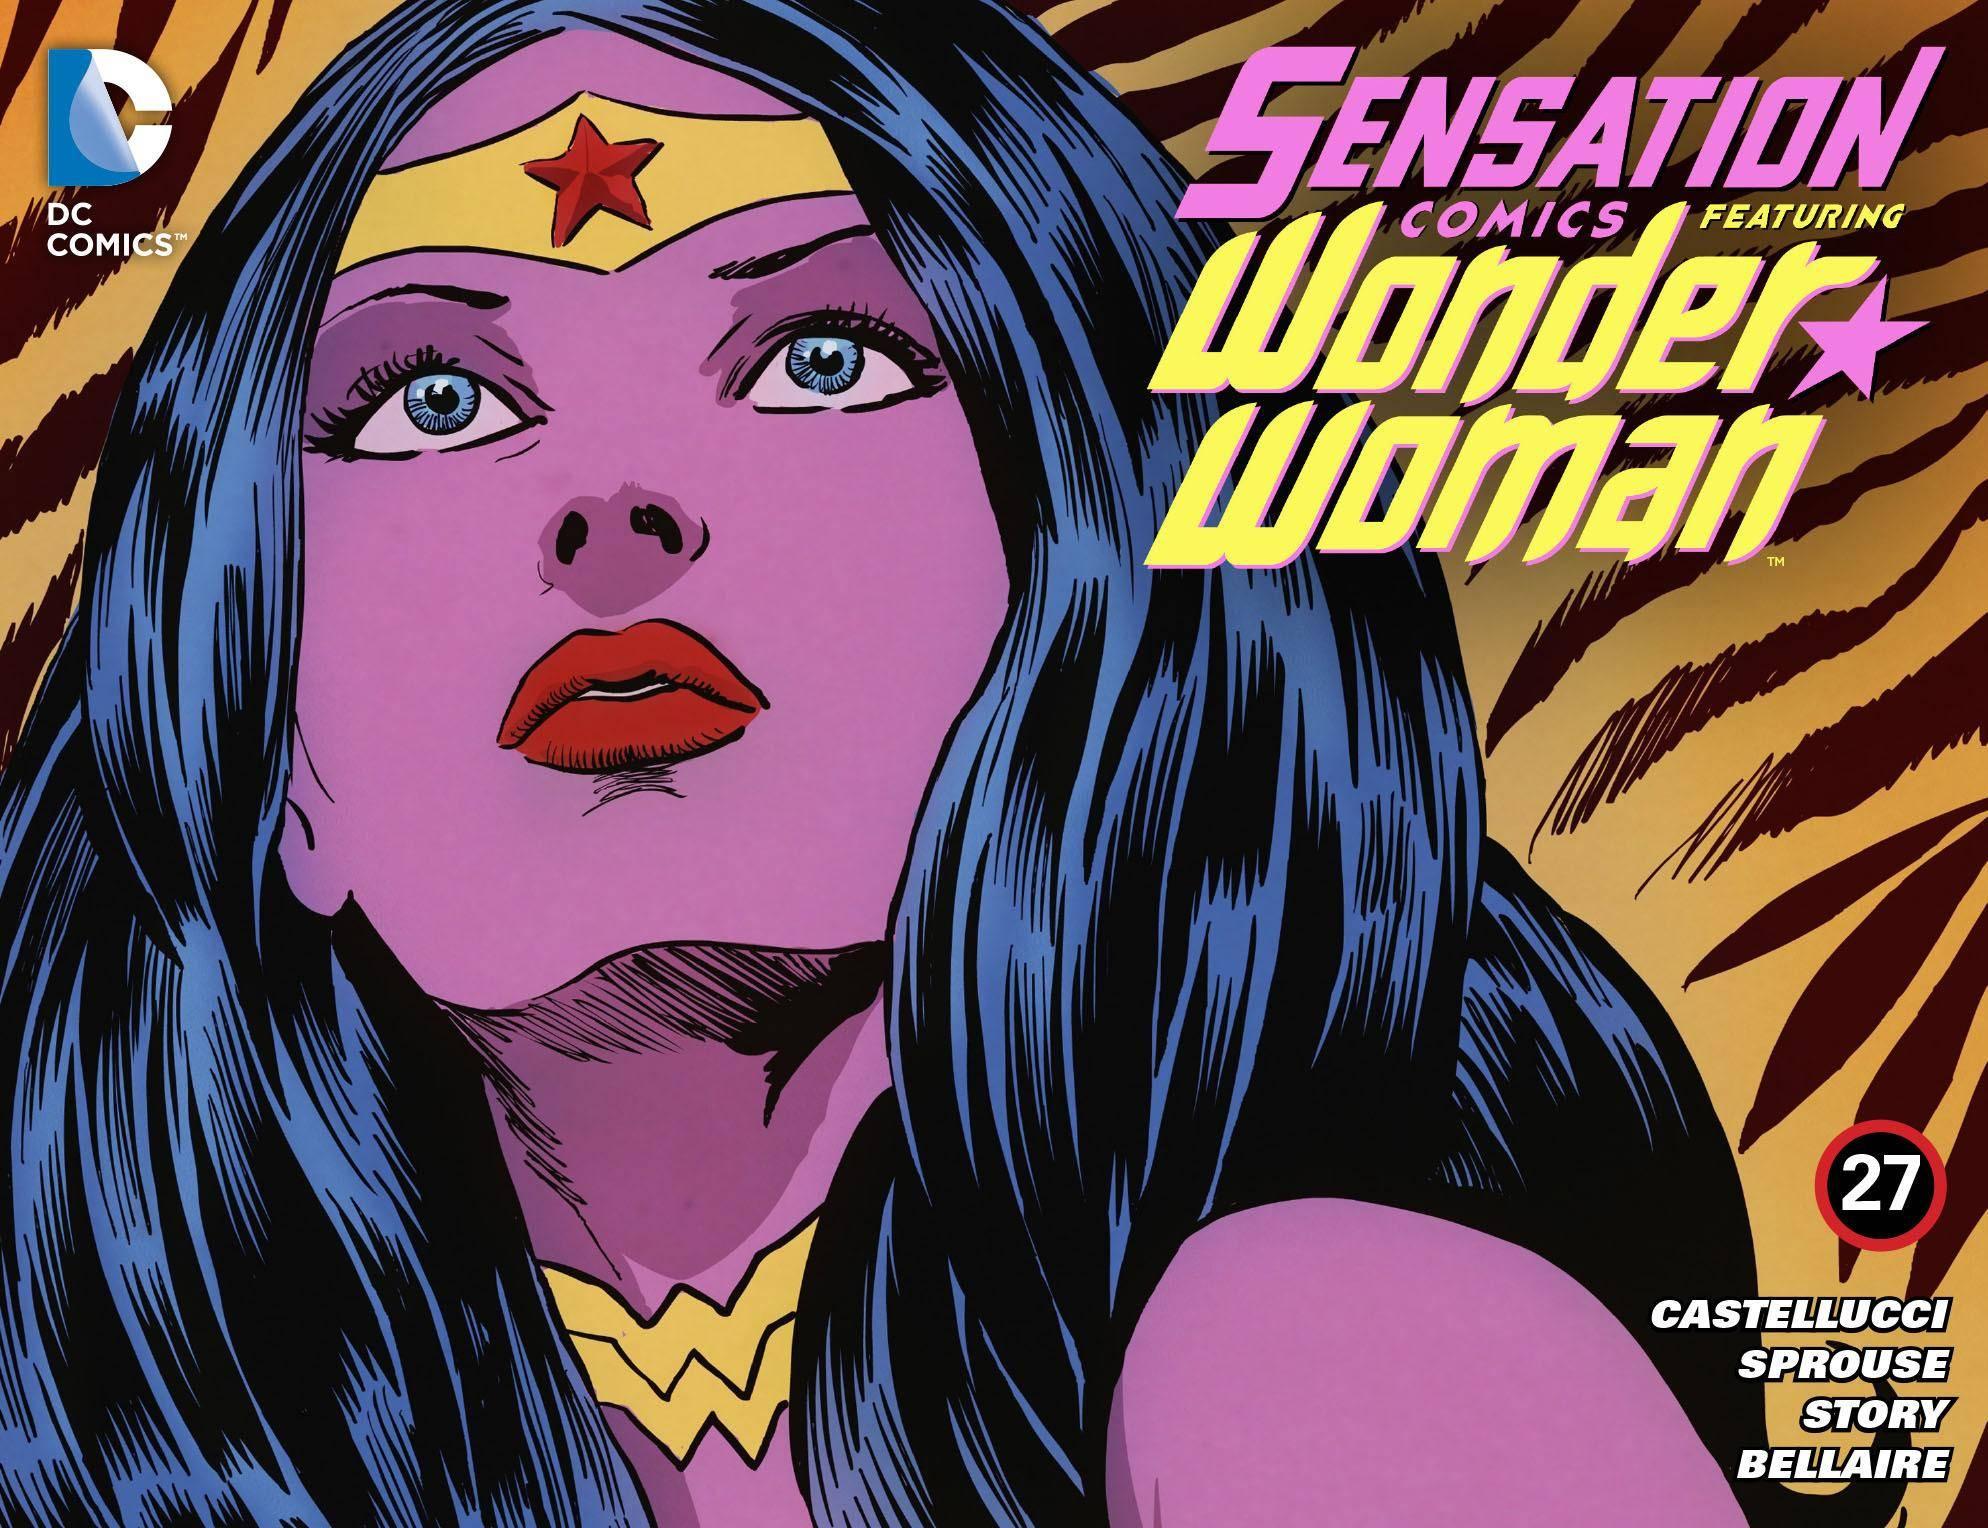 Sensation Comics Featuring Wonder Woman 027 2015 Digital Son Of Ultron-EMPIRE